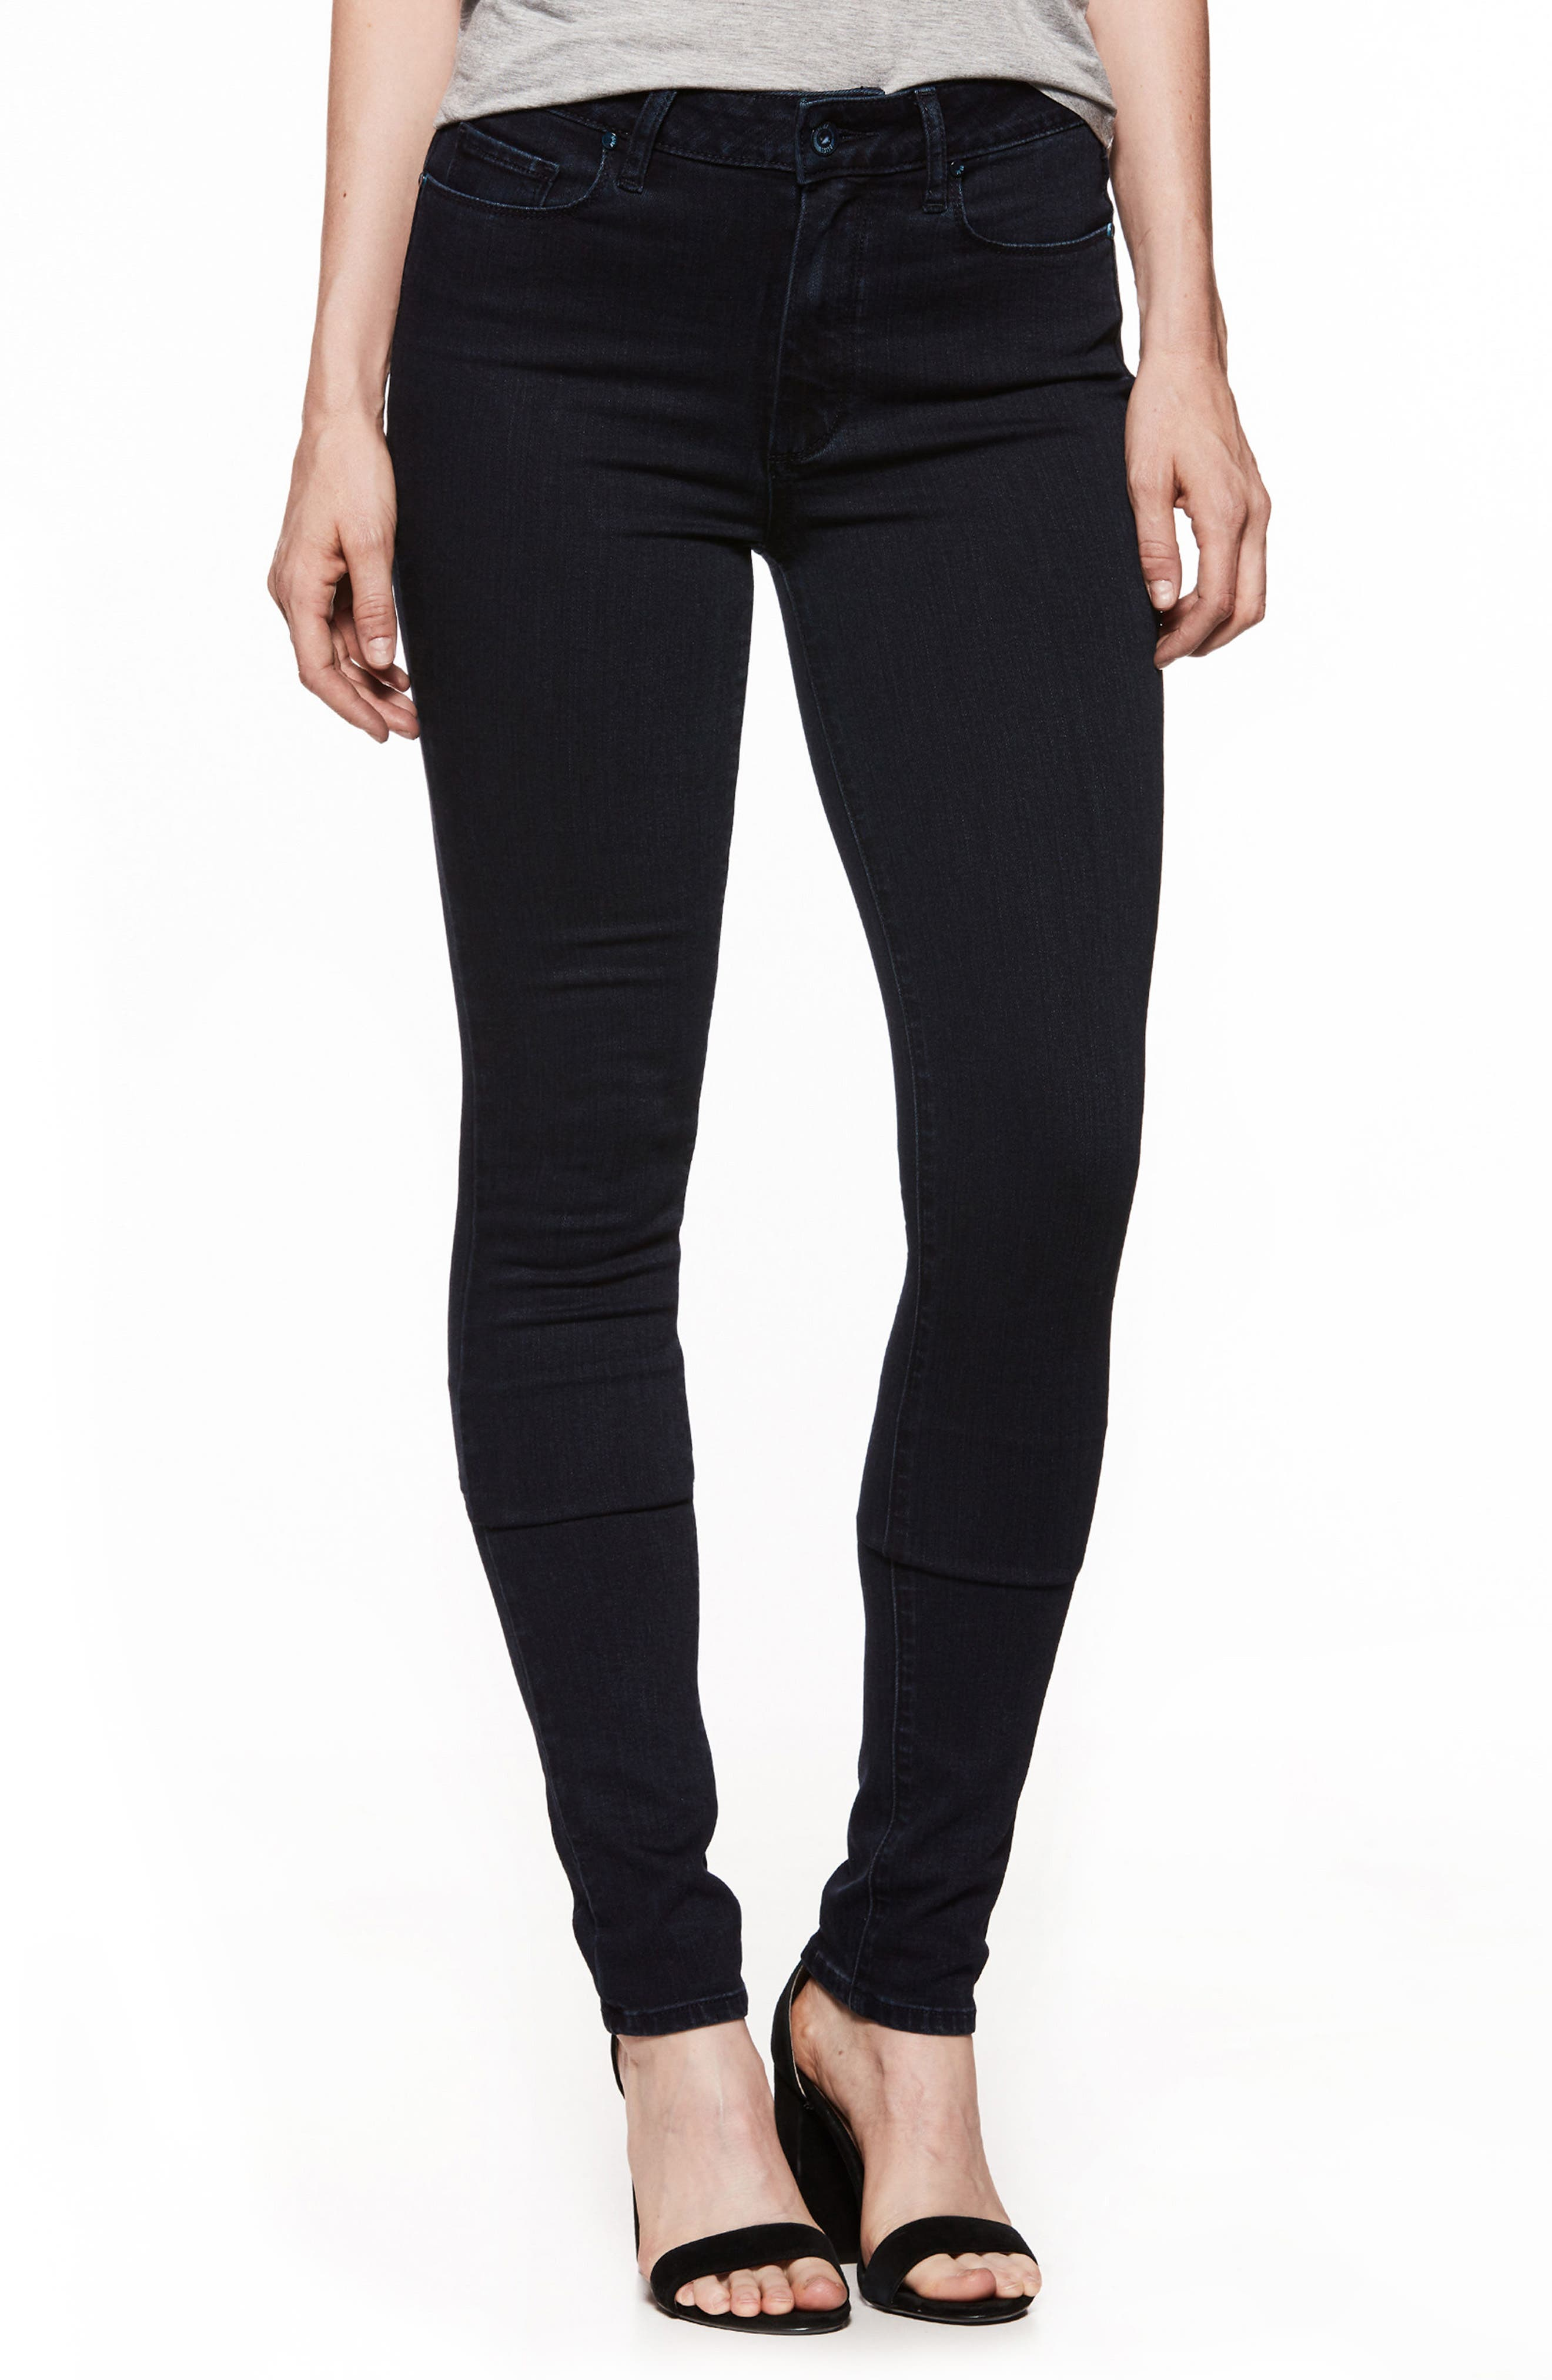 Transcend - Leggy High Waist Ultra Skinny Jeans,                         Main,                         color, ALLEY